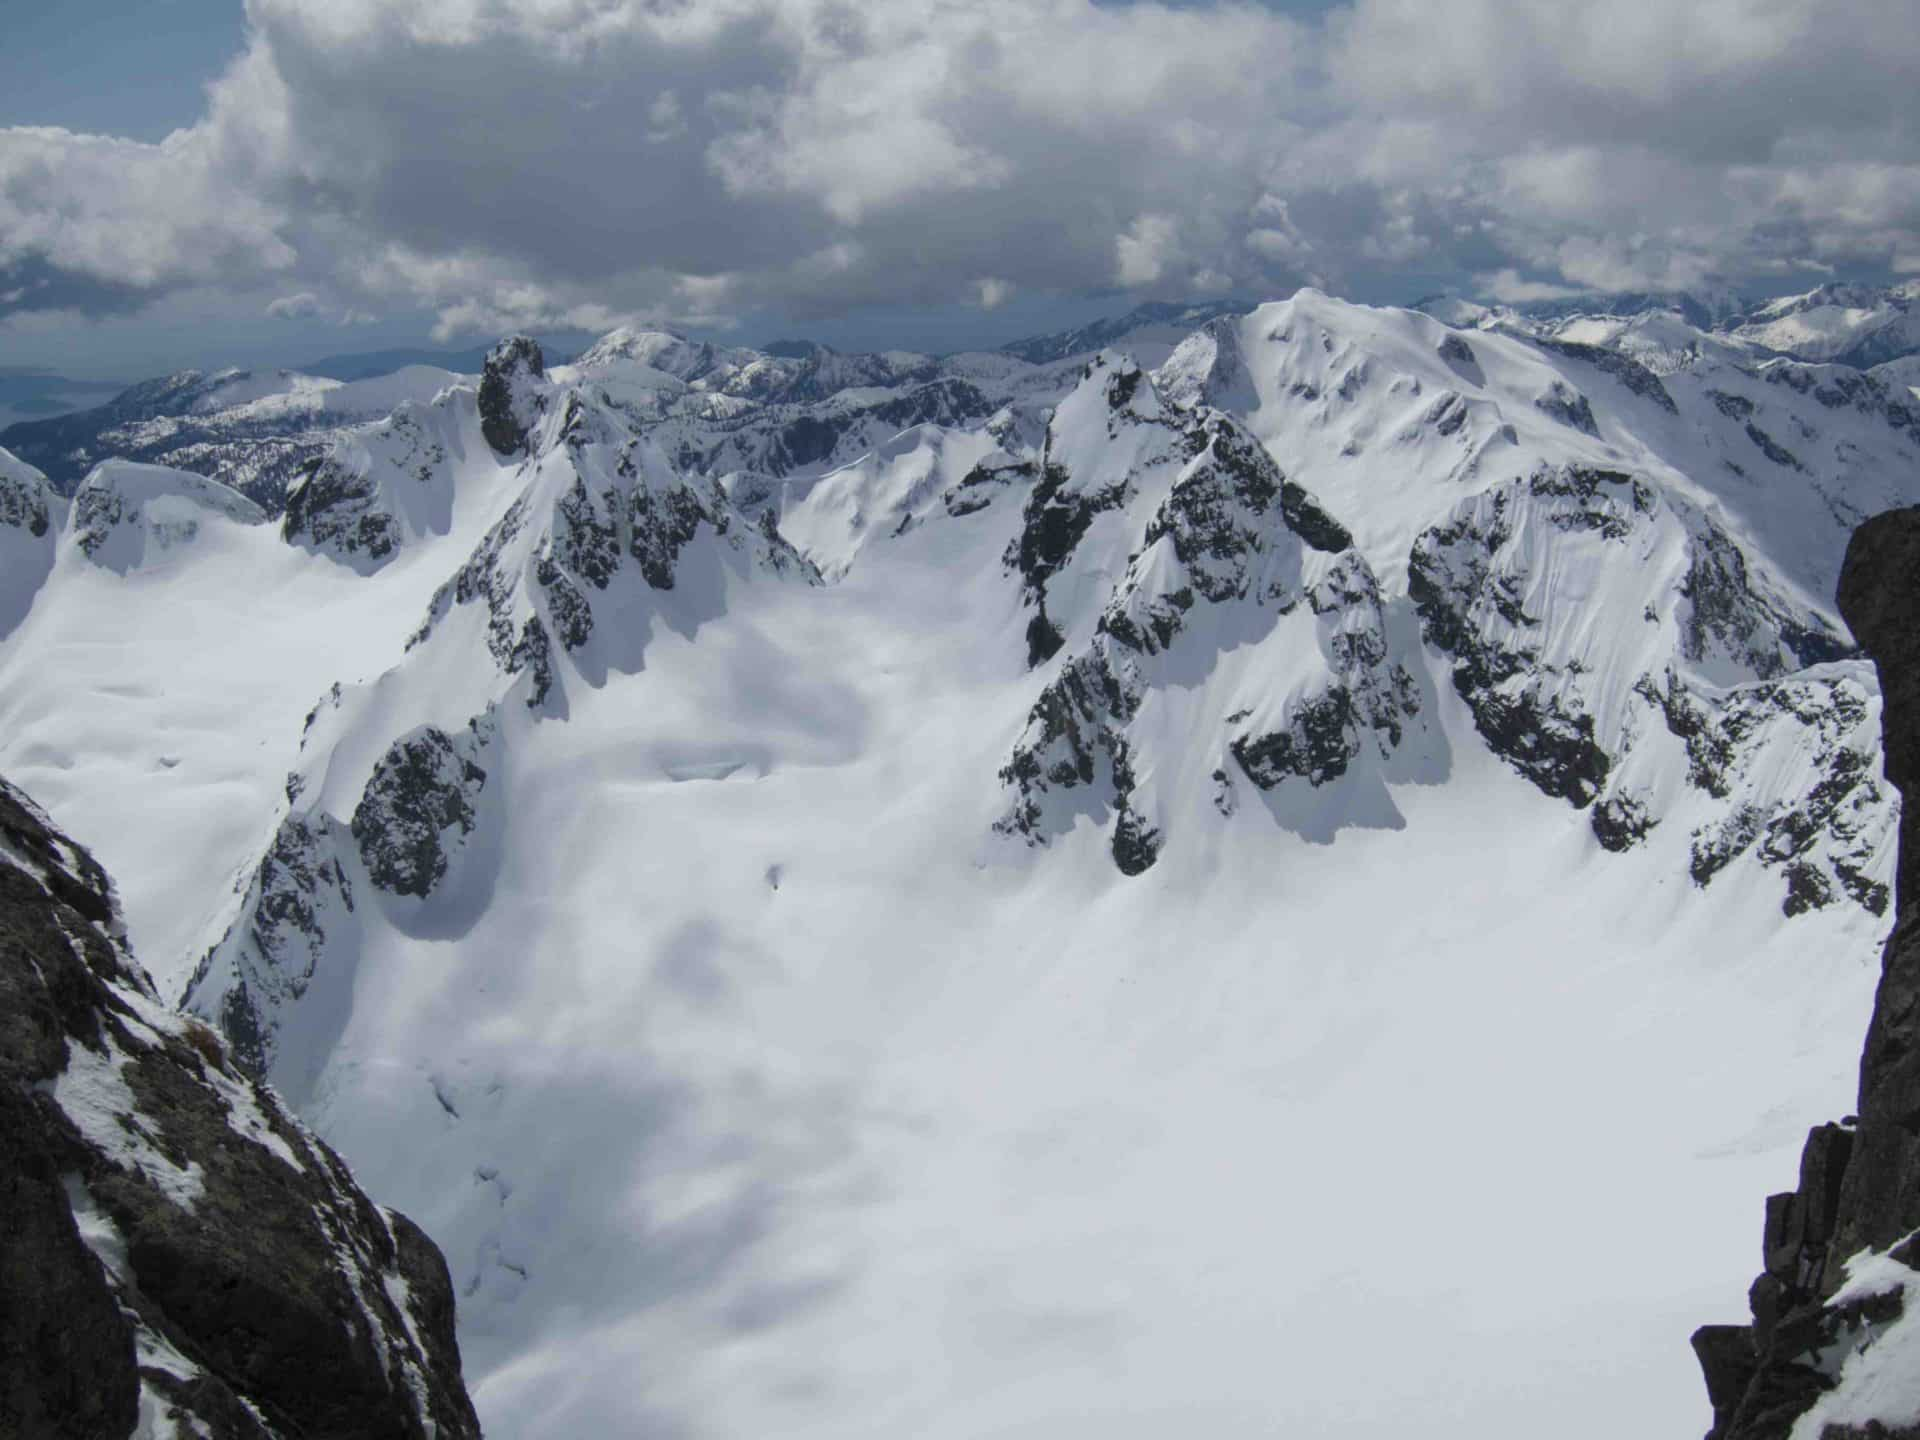 Backcountry skiing in Tantalus Range